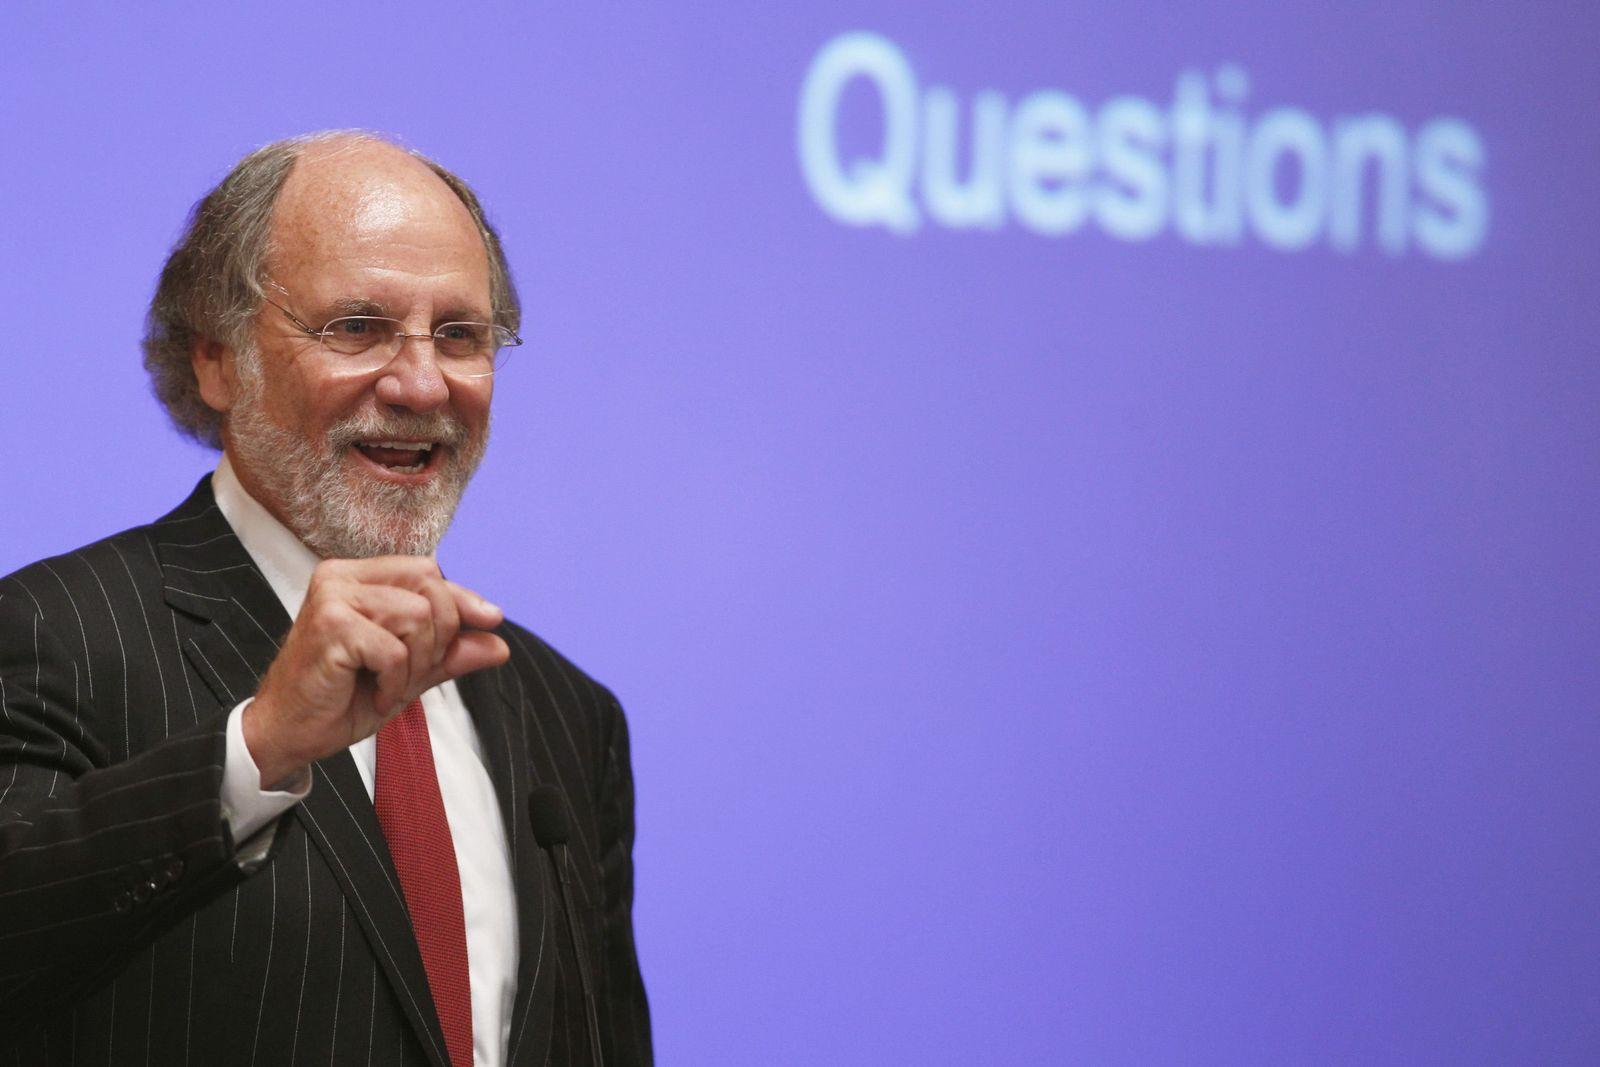 John Corzine